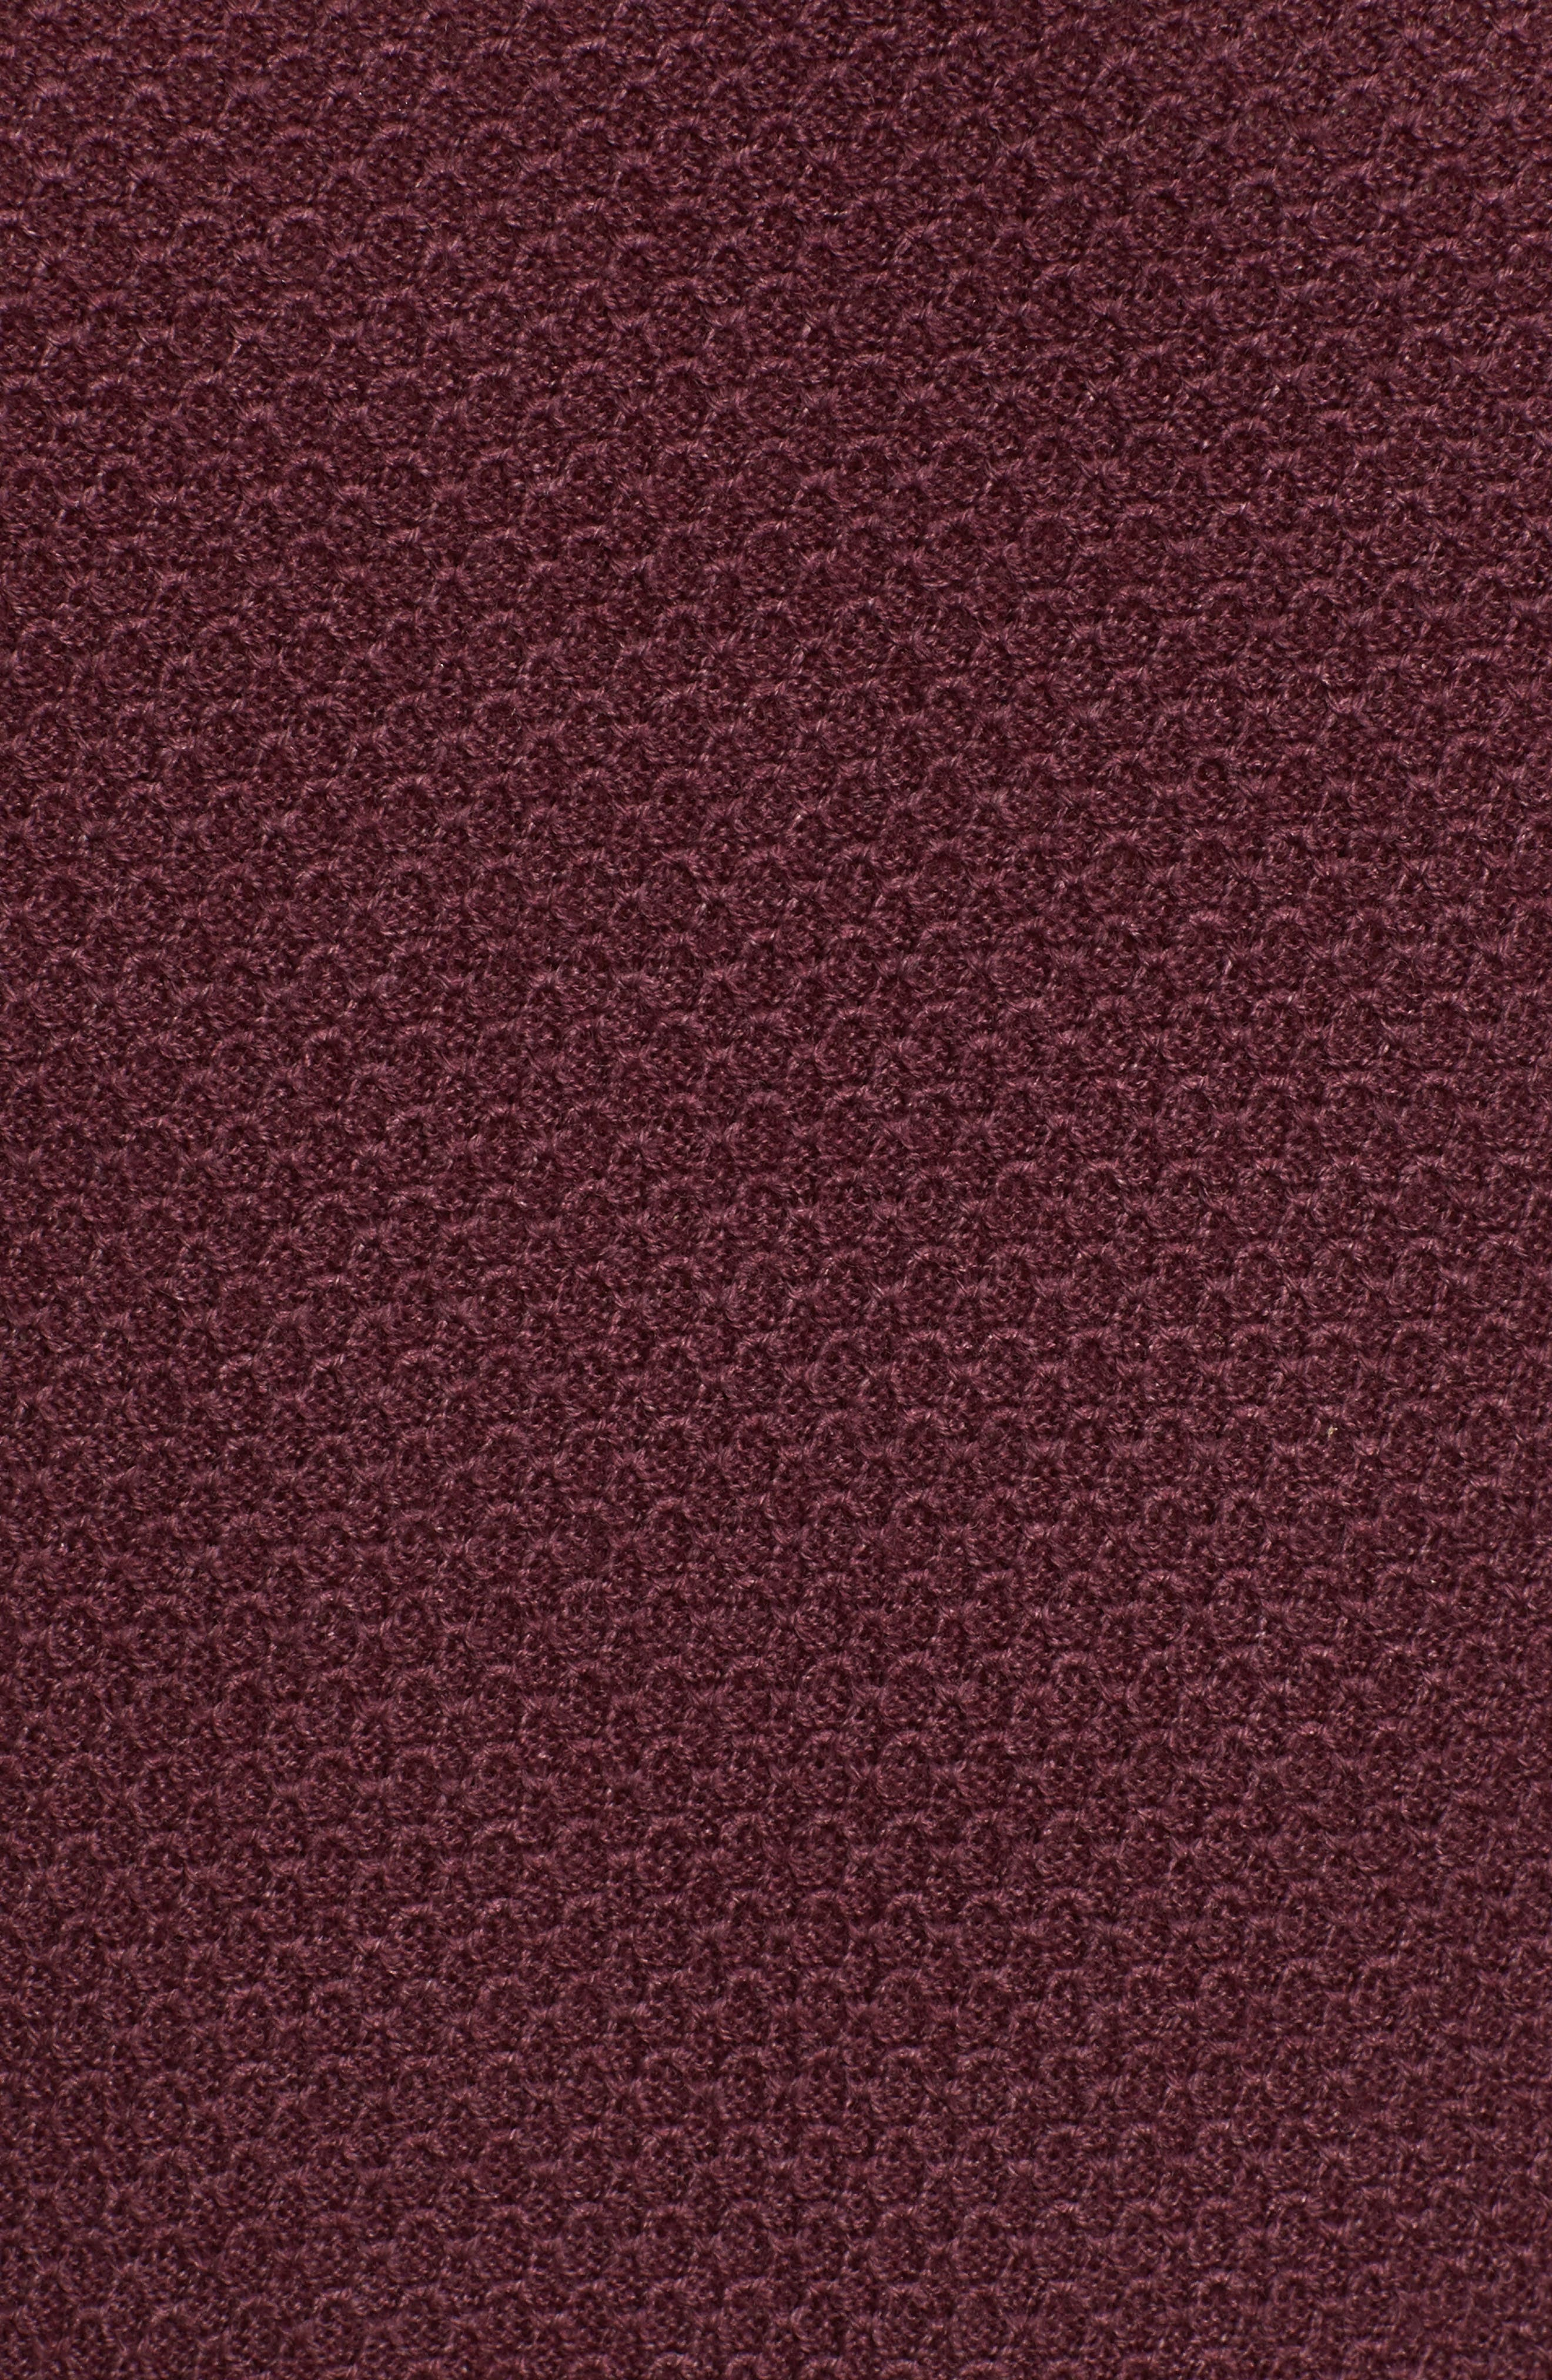 Honeycomb Merino Crewneck Sweater,                             Alternate thumbnail 5, color,                             Burgundy